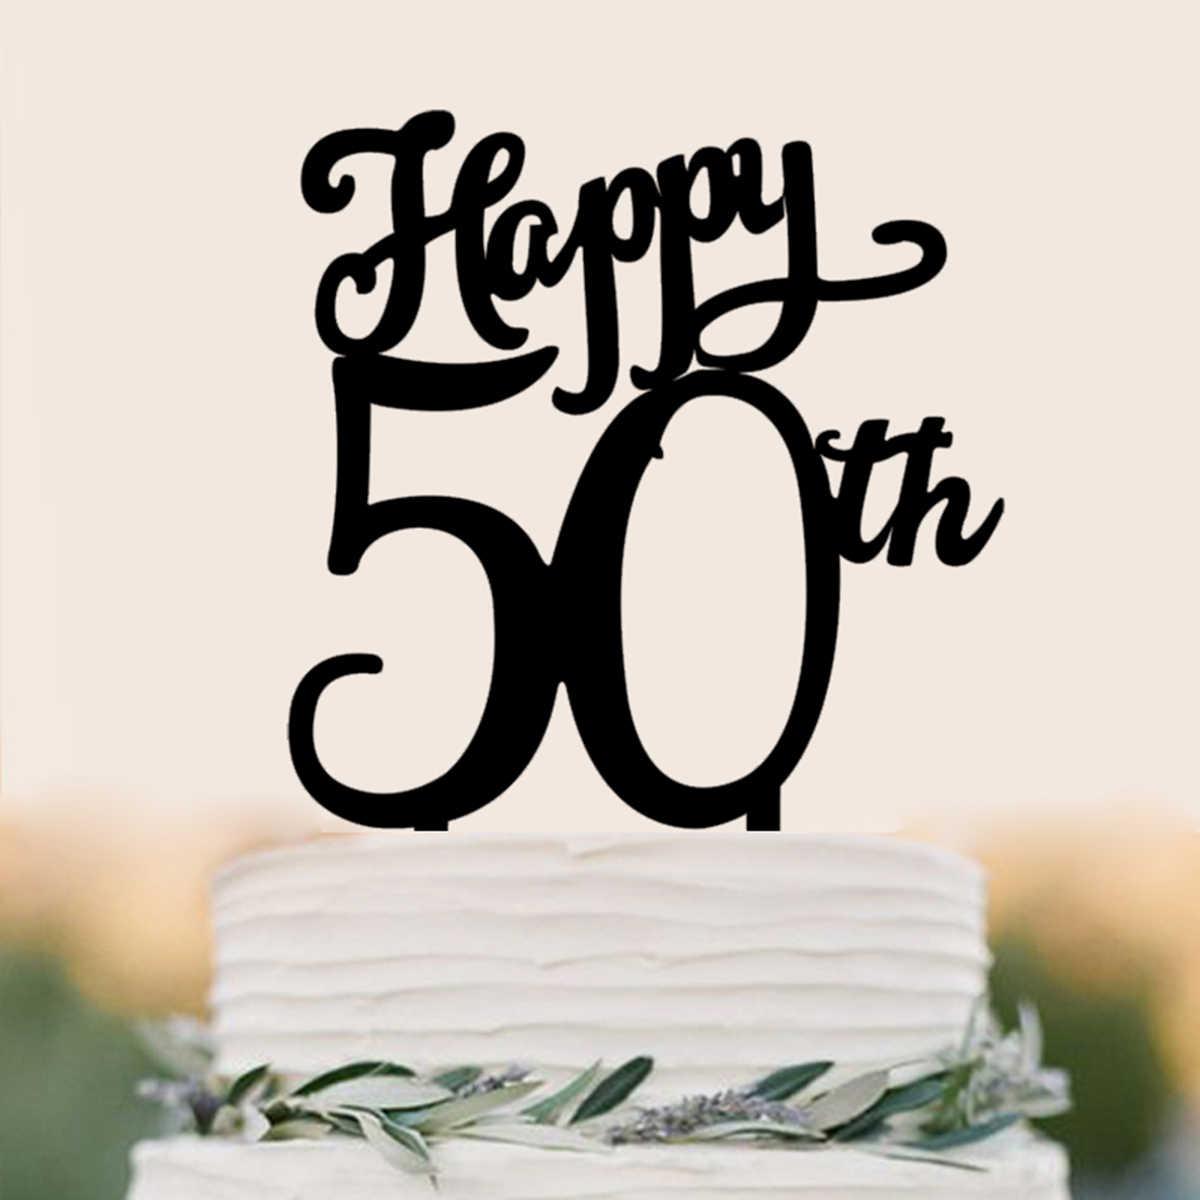 Happy 50th Birthday Cake Topper Acrylic Decoration Black